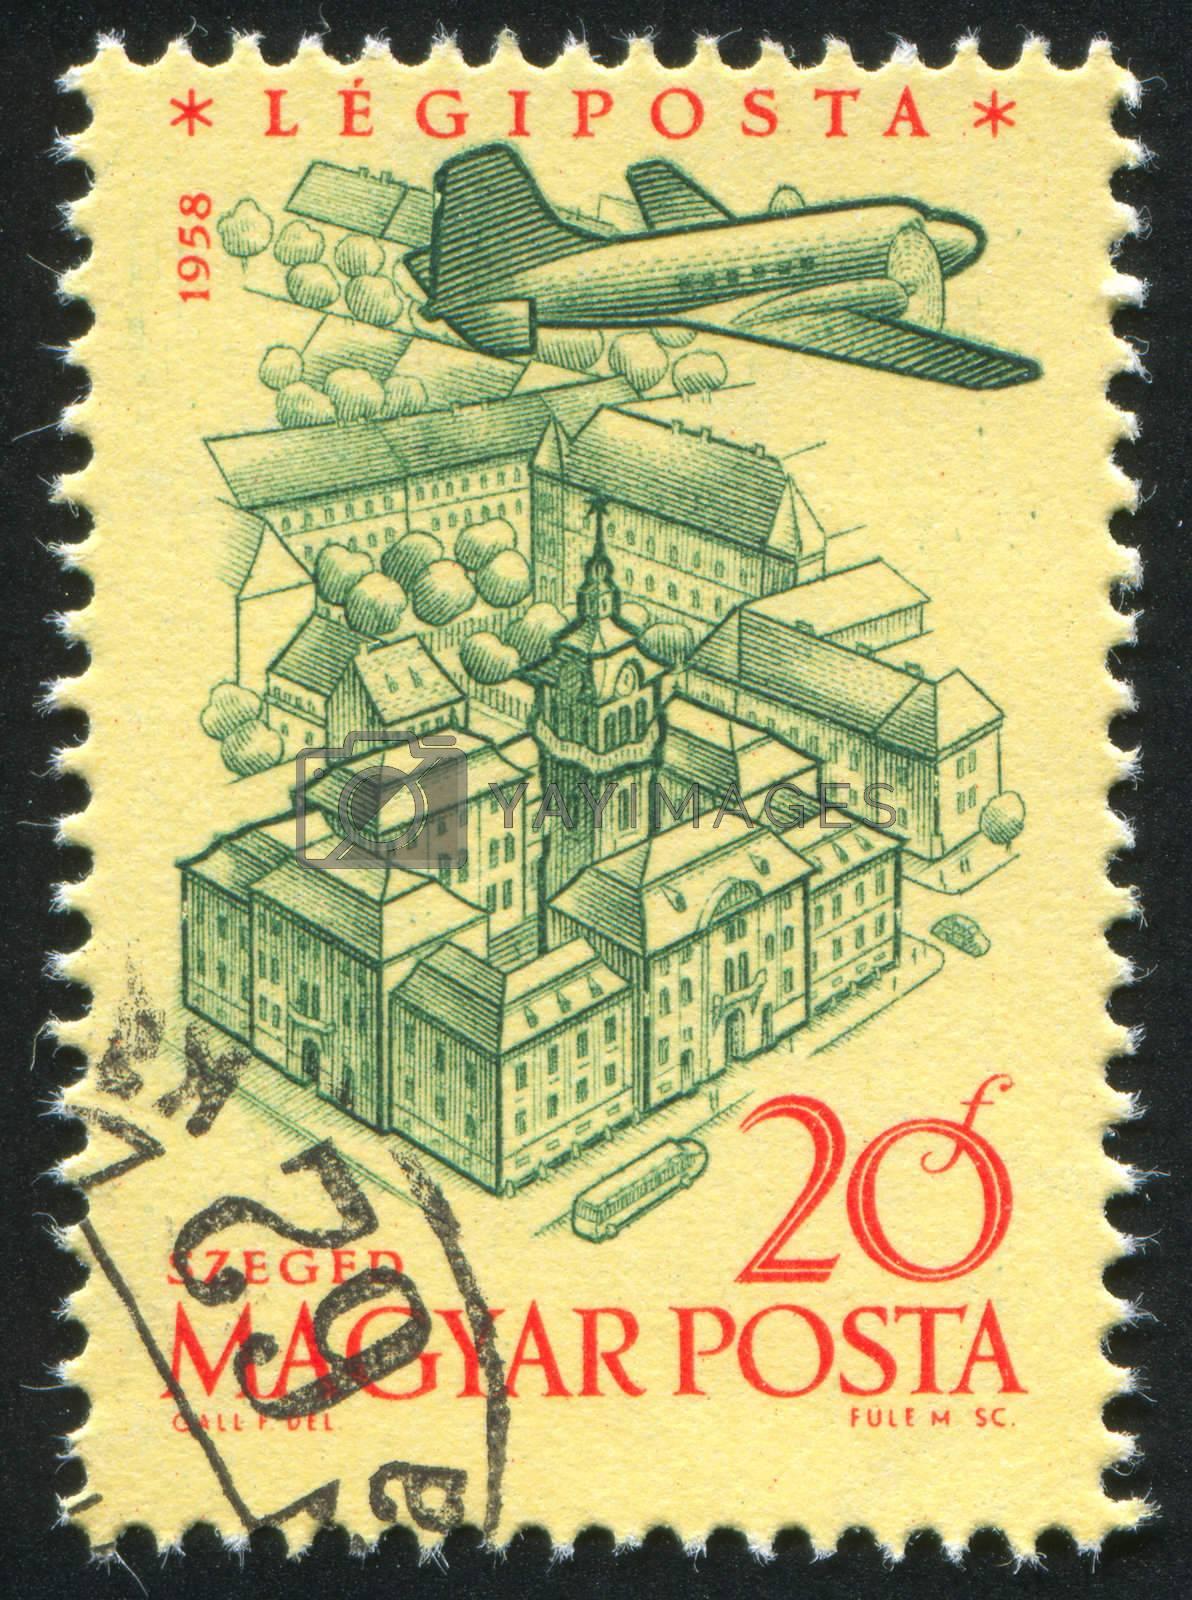 HUNGARY - CIRCA 1958: stamp printed by Hungary, shows Plane over zeged, circa 1958